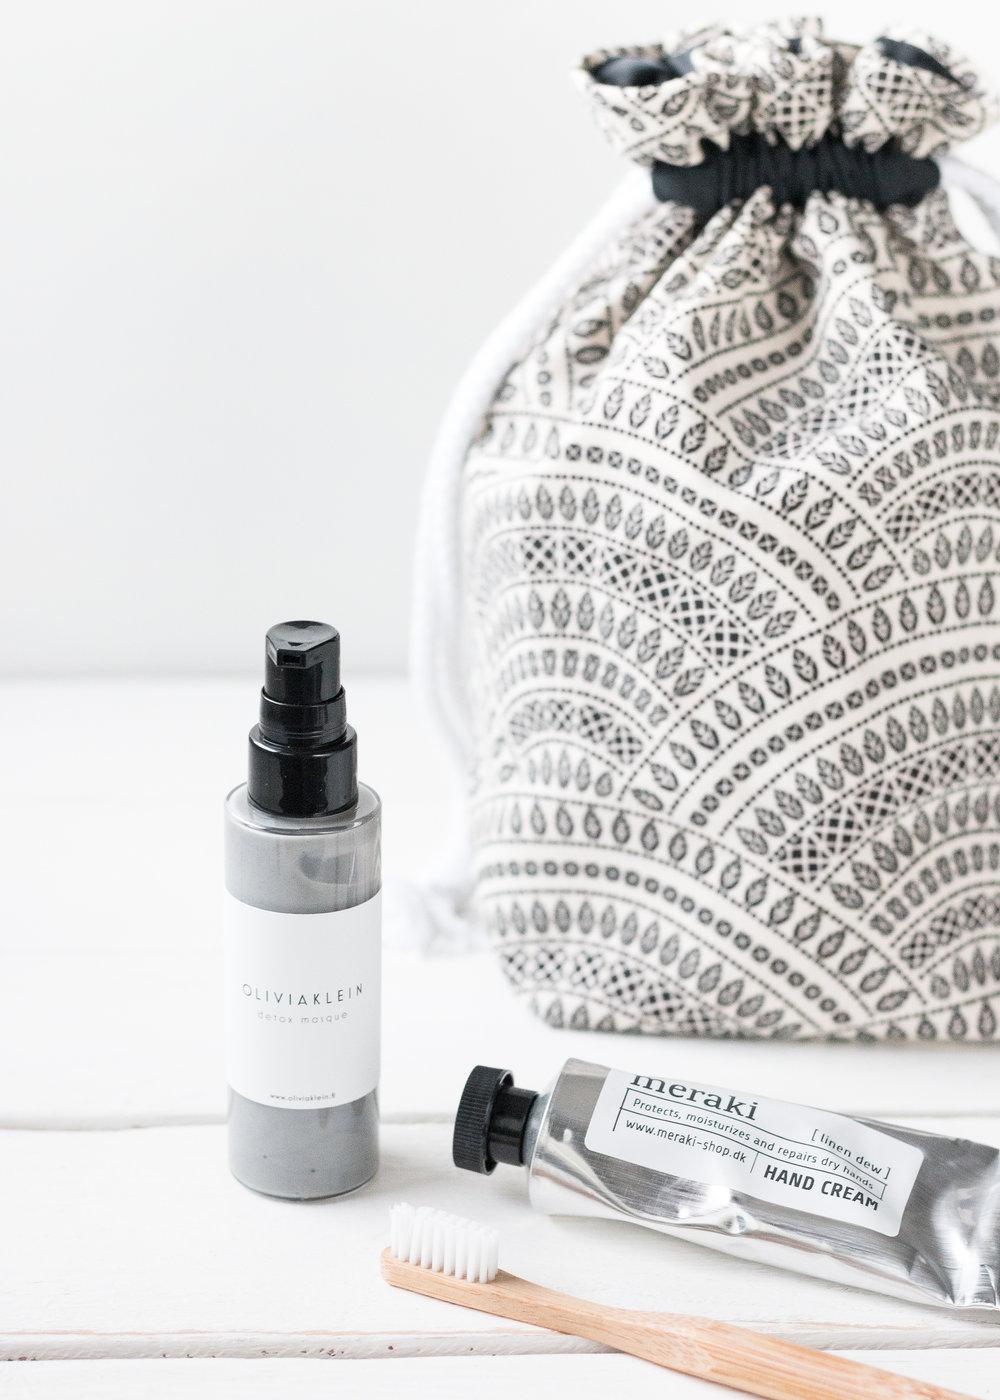 Boho drawstring cosmetic bag | Finnish design by Sandramaria | Sandramarias.com.jpg